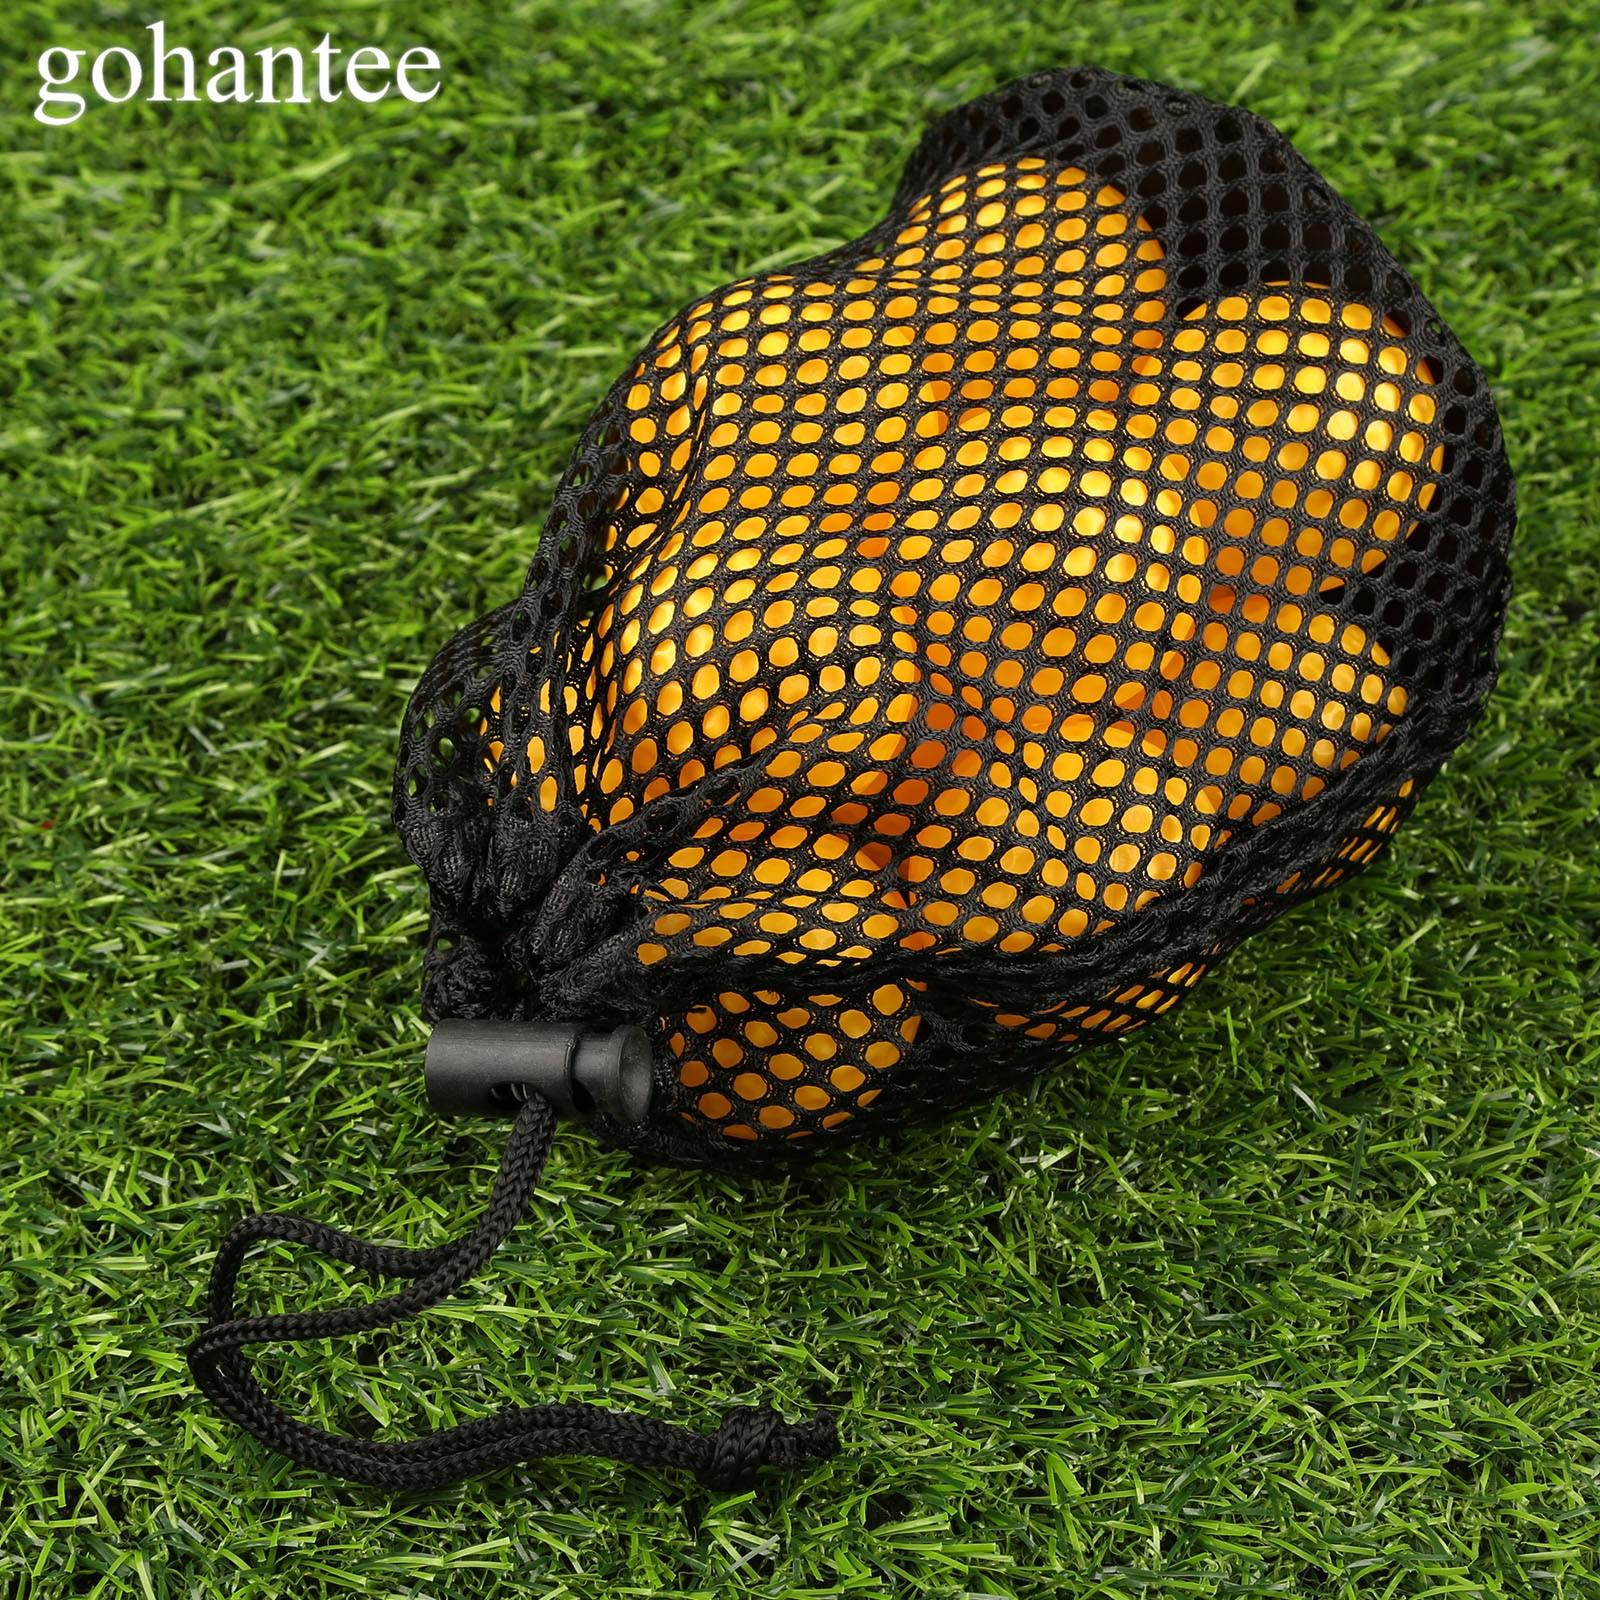 Nylon Mesh Nets Bag Pouch Fit Golf Tennis Hold 12-16 Balls Holder Outdoor Sports Golf Balls Storage Closure Golf Training Aids